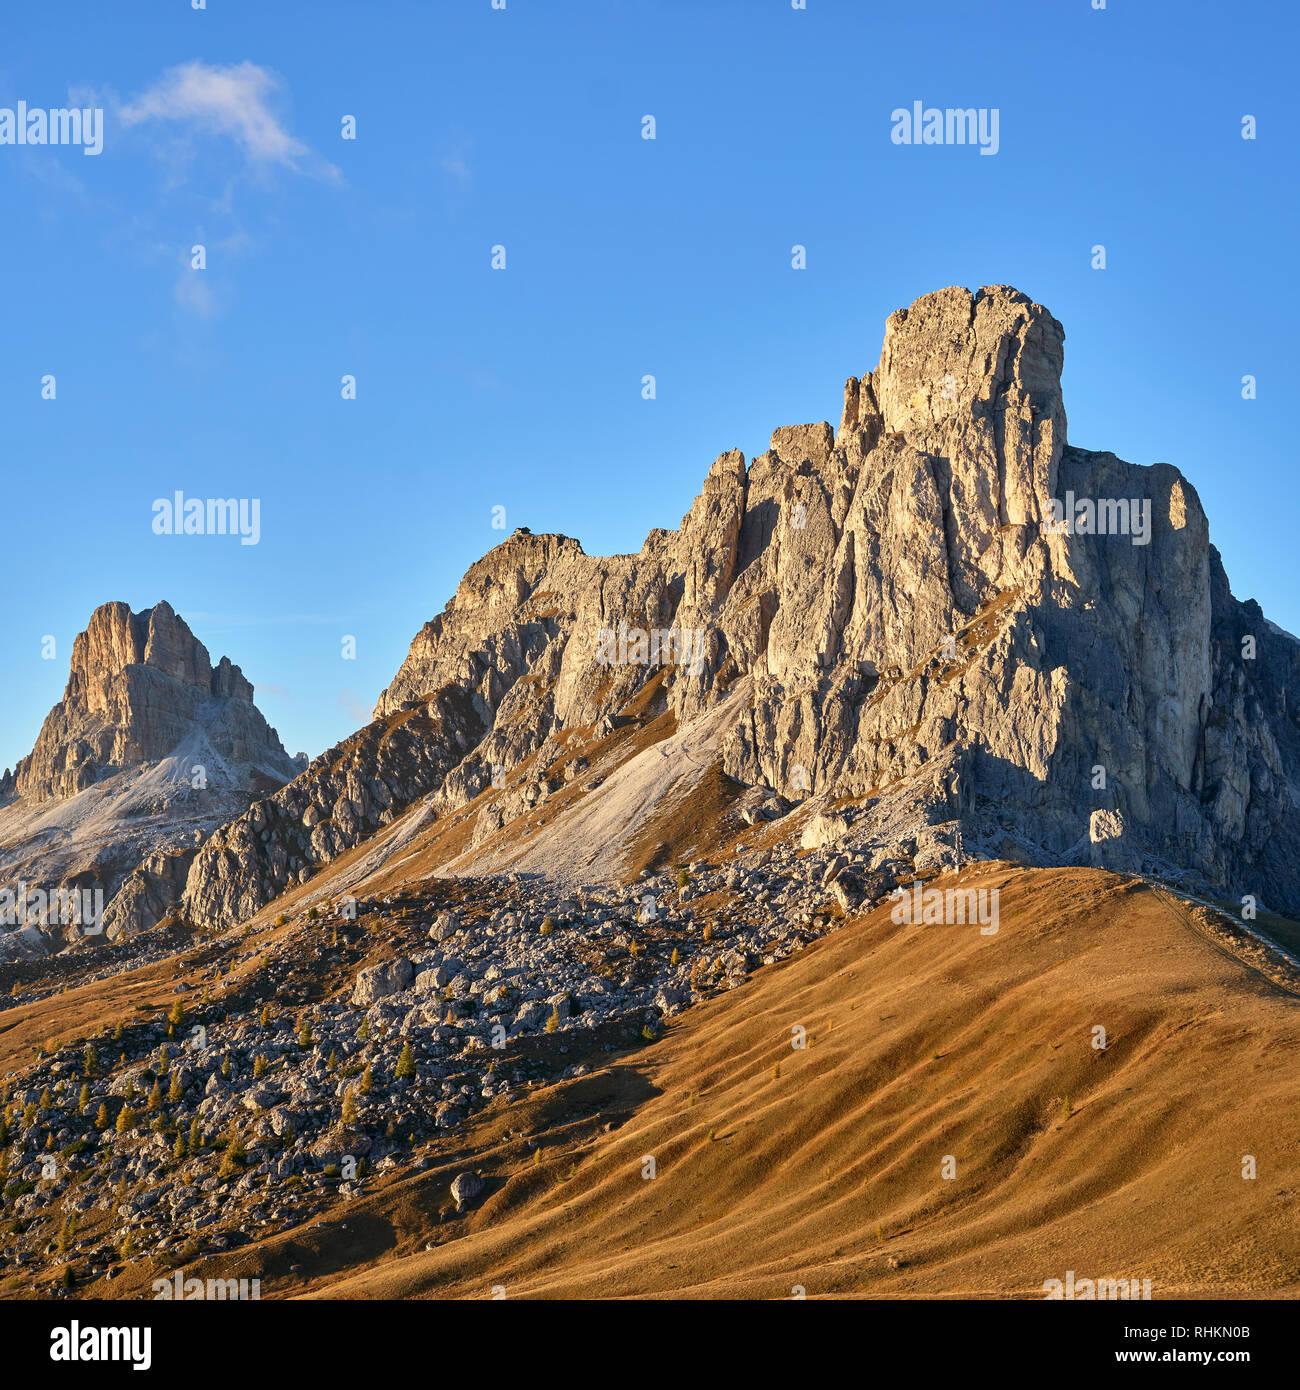 View of Ra Guesla, Nuvolau and Averau from Passo Giau, Dolomites, Belluno, Veneto, Italy - Stock Image